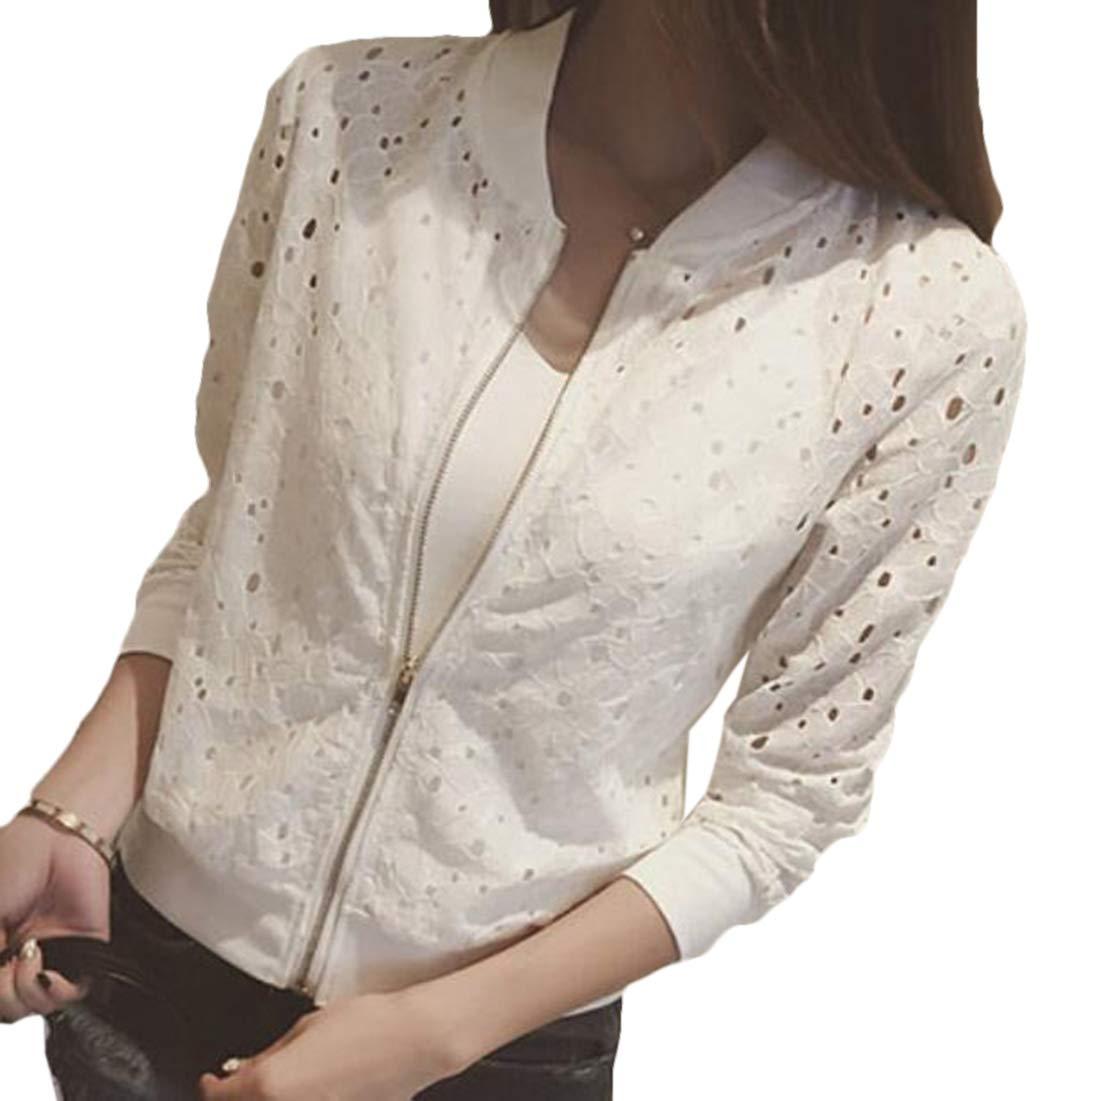 BYWX Women Baseball Uniform Lace Jacket Lace Hollow Long Sleeve Zip up Coat White US L